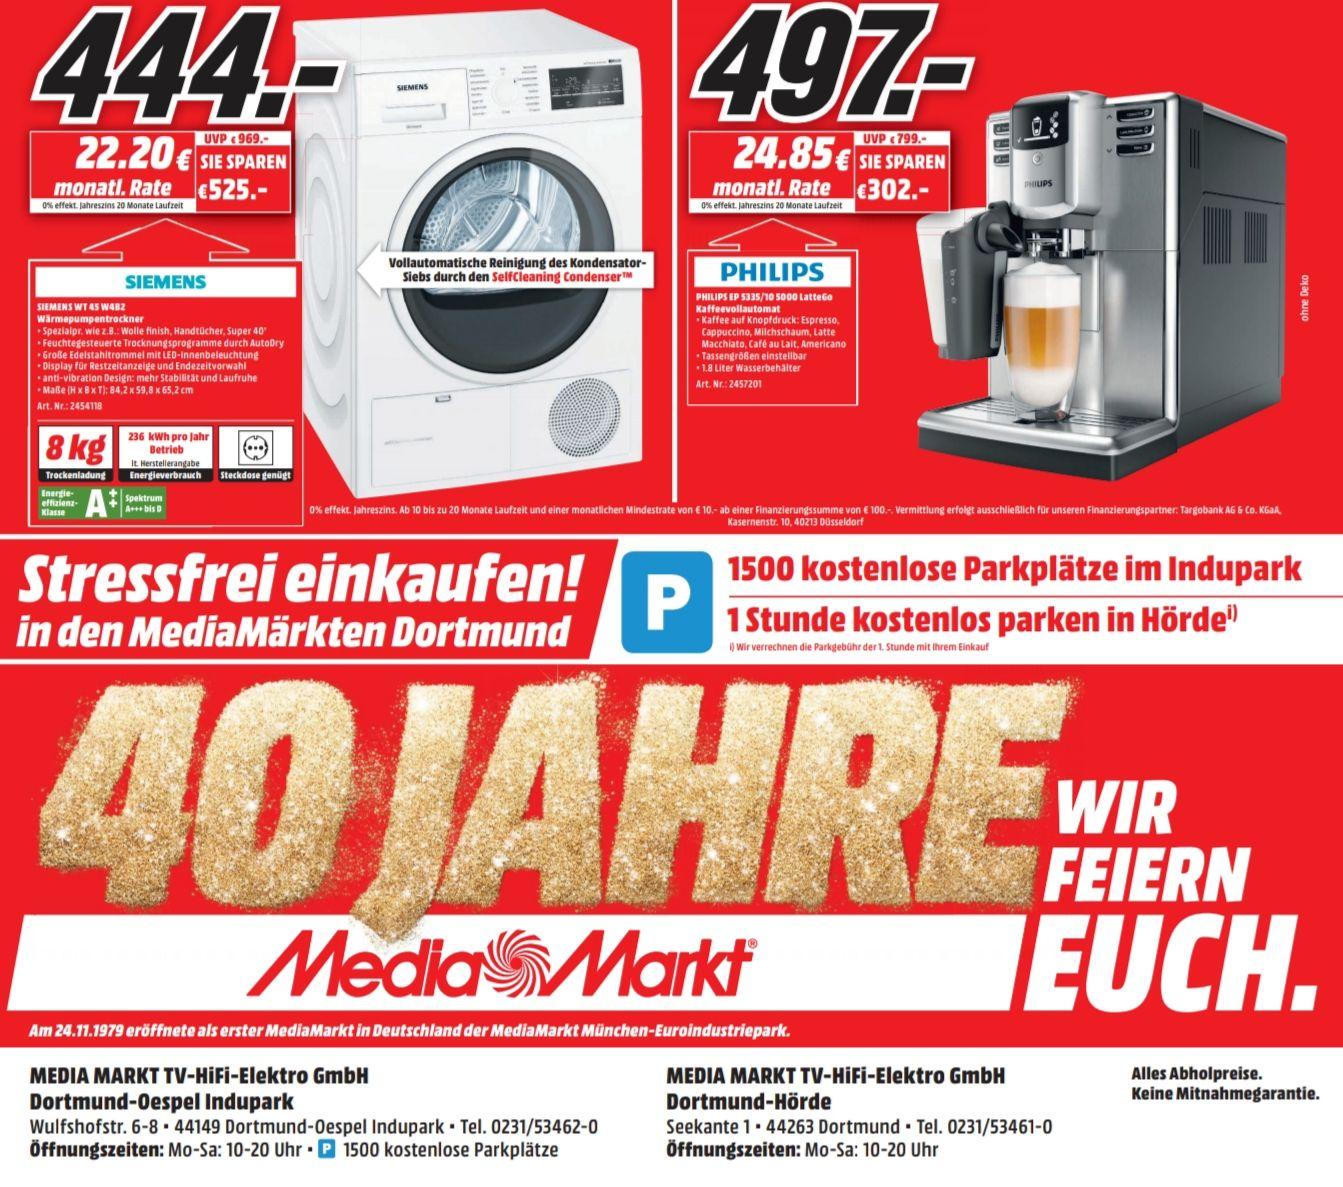 [LOKAL Media Markt Dortmund] Philips EP5335/10 Latte Go Kaffeevollautomat 497€ // Siemens WT45W4B2 Wärmepumpentrockner A++ 444€